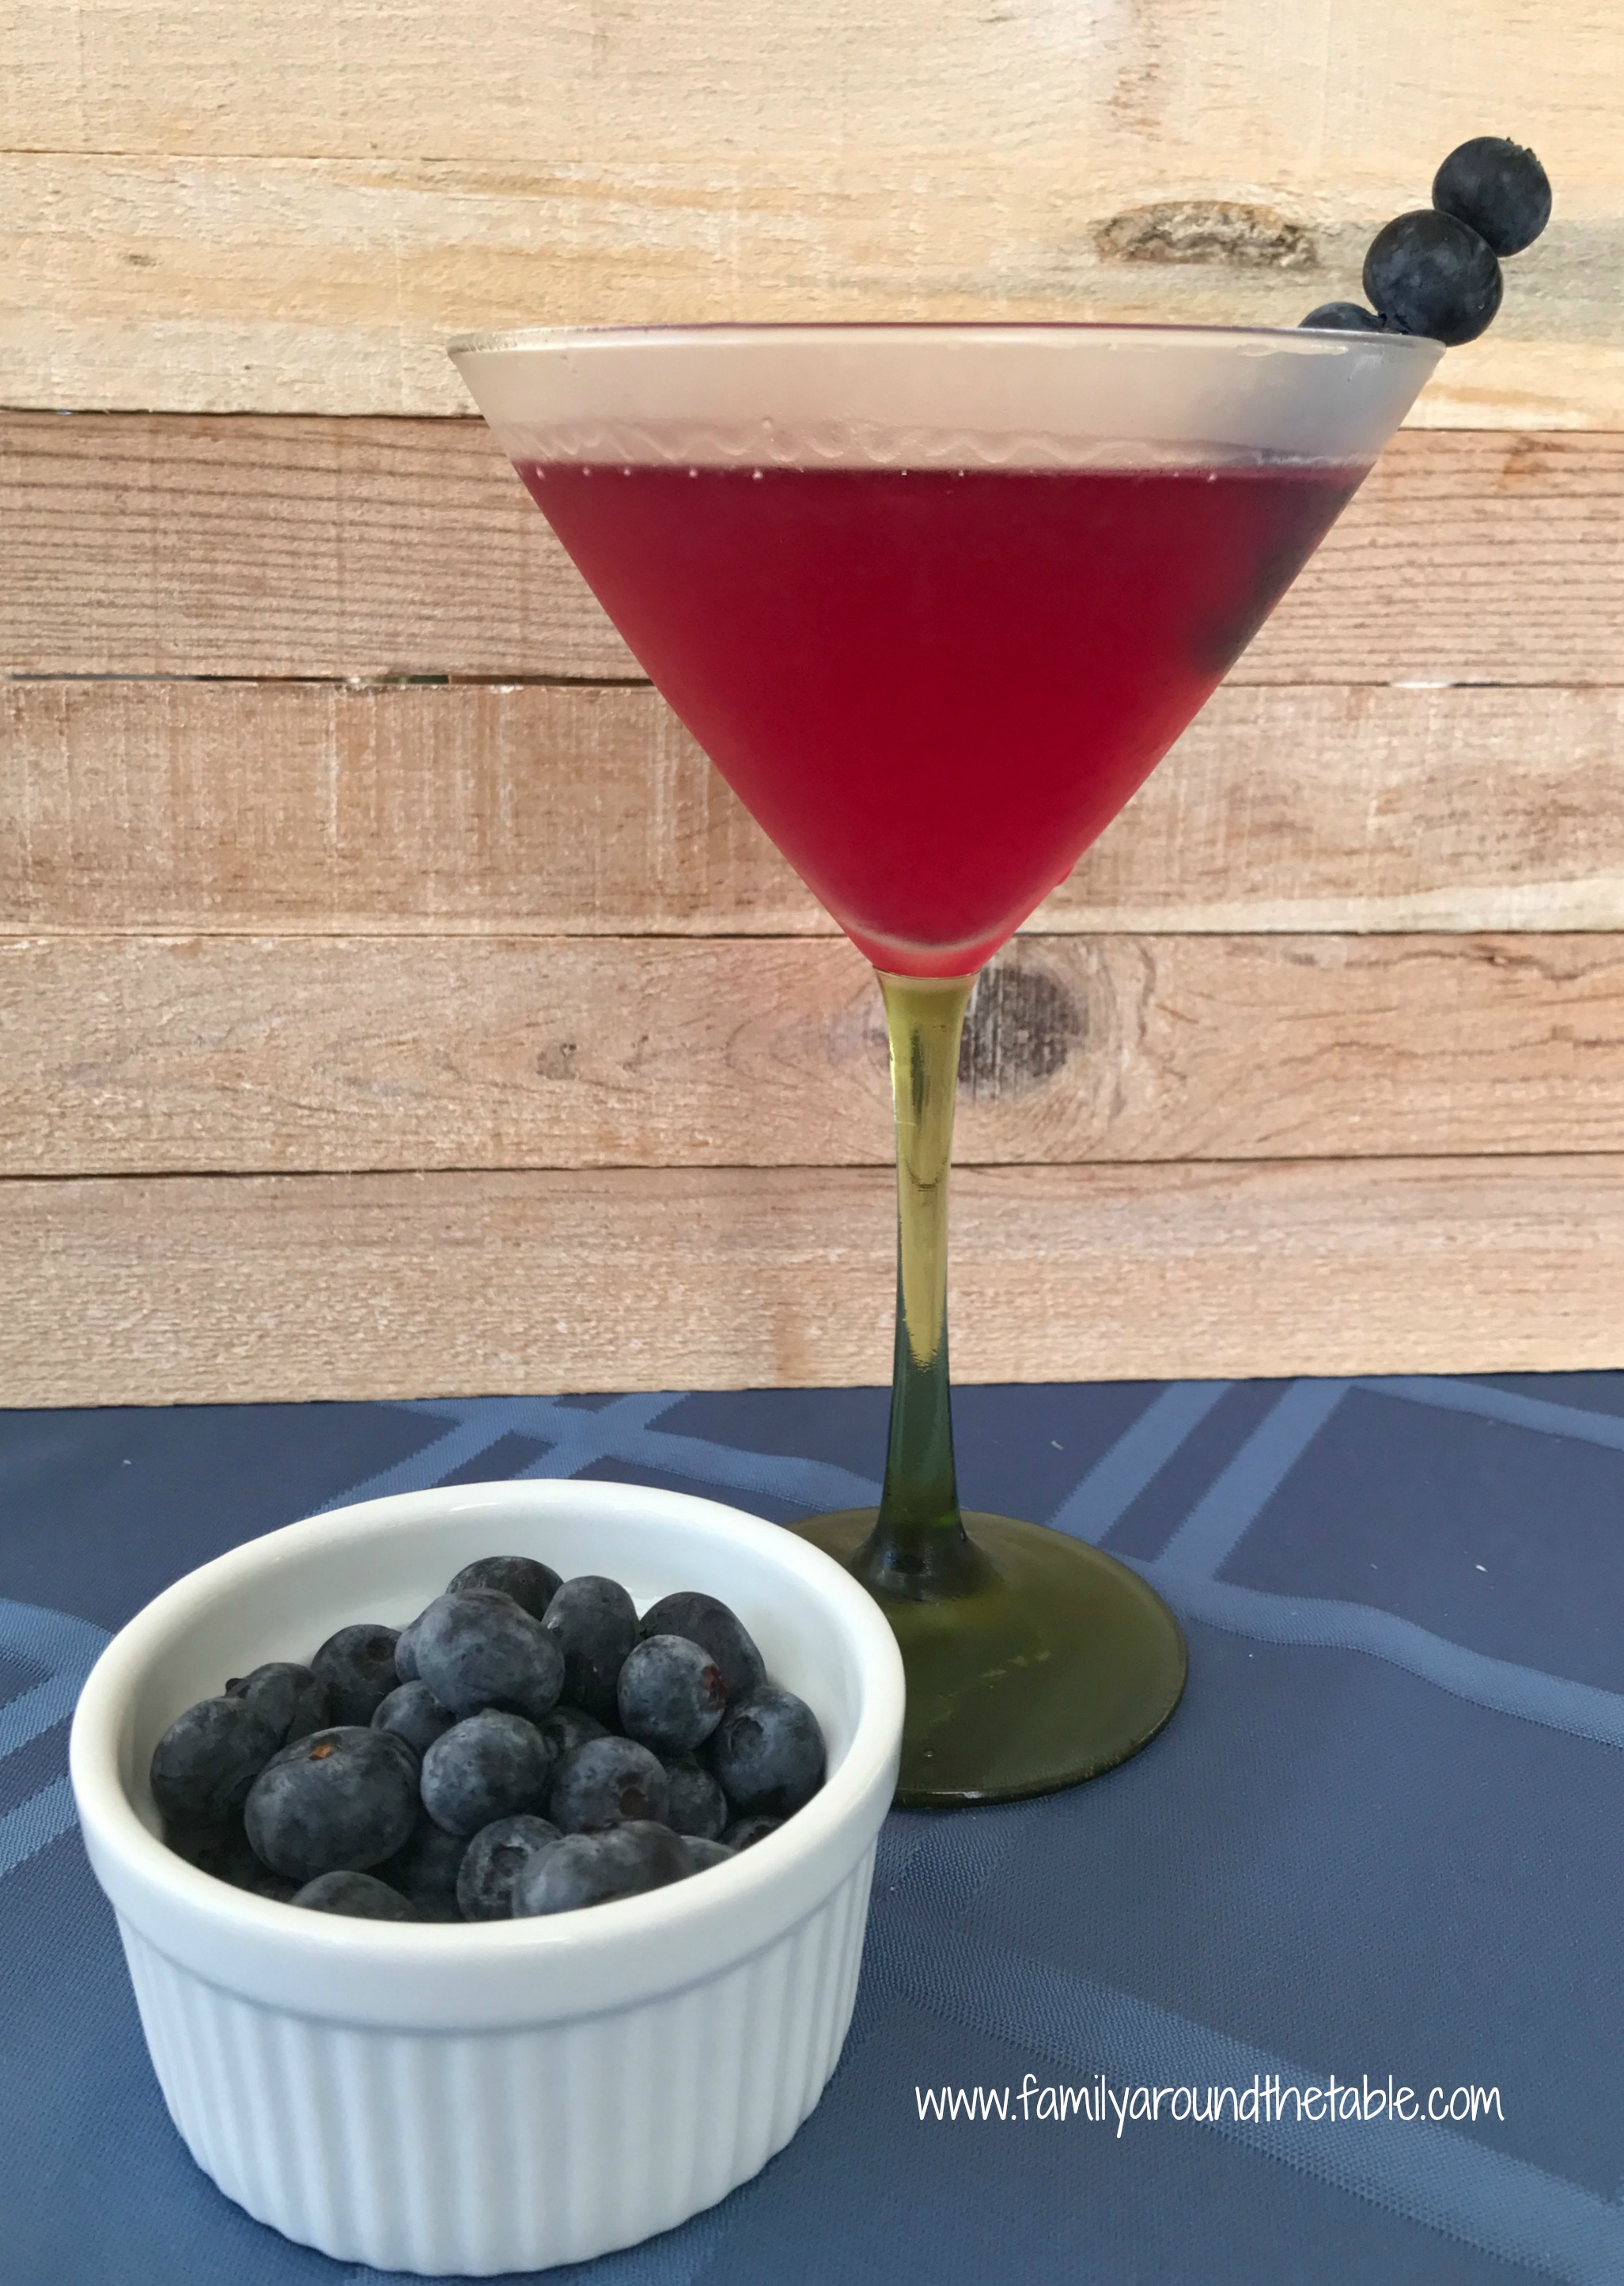 Blueberry lemon vodka martini nationalmartiniday family for Vodka martini